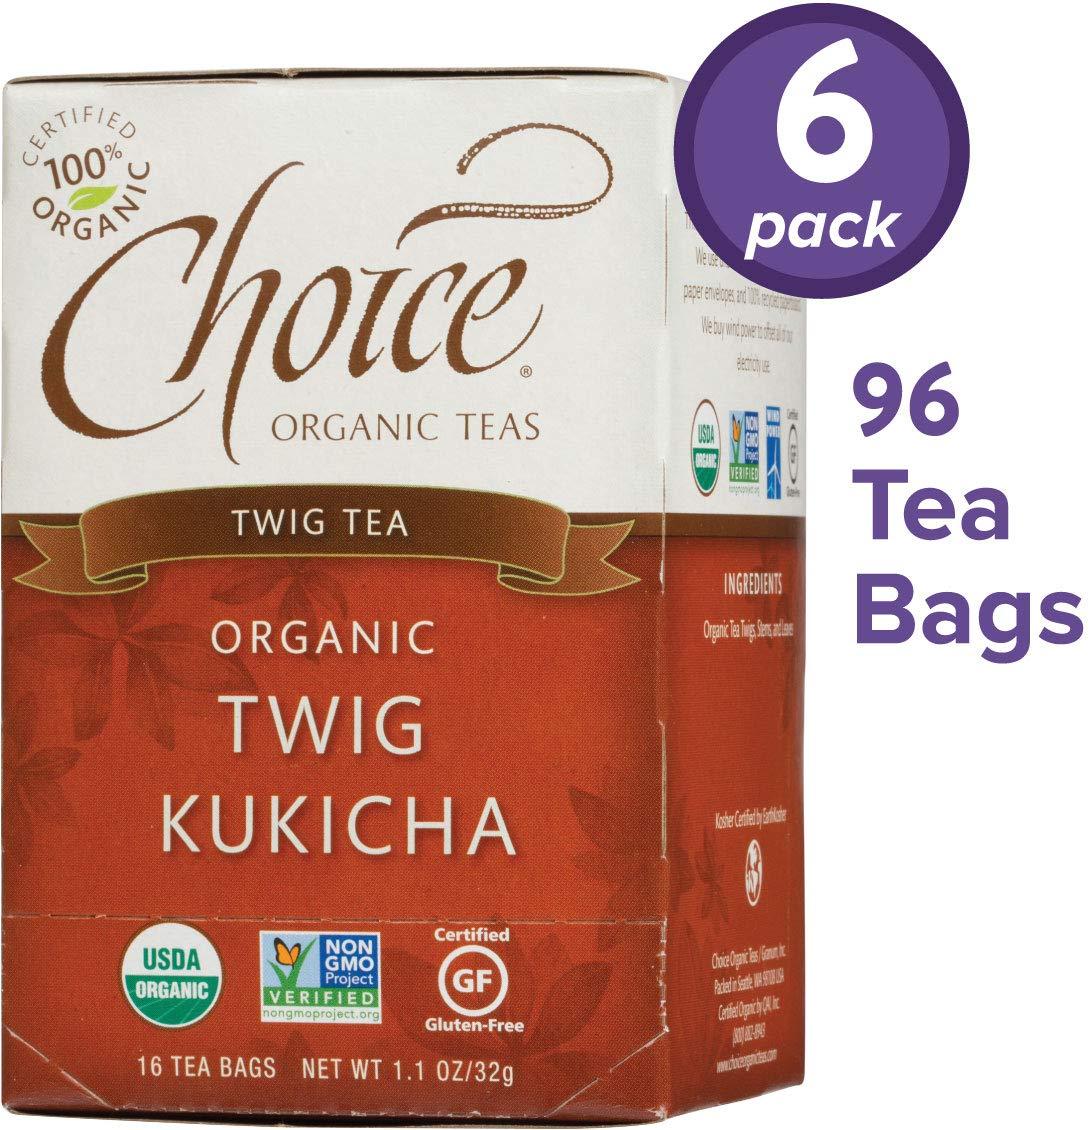 Choice Organic Teas Twig Tea, 6 Boxes of 16 (96 Tea Bags), Twig Kukicha